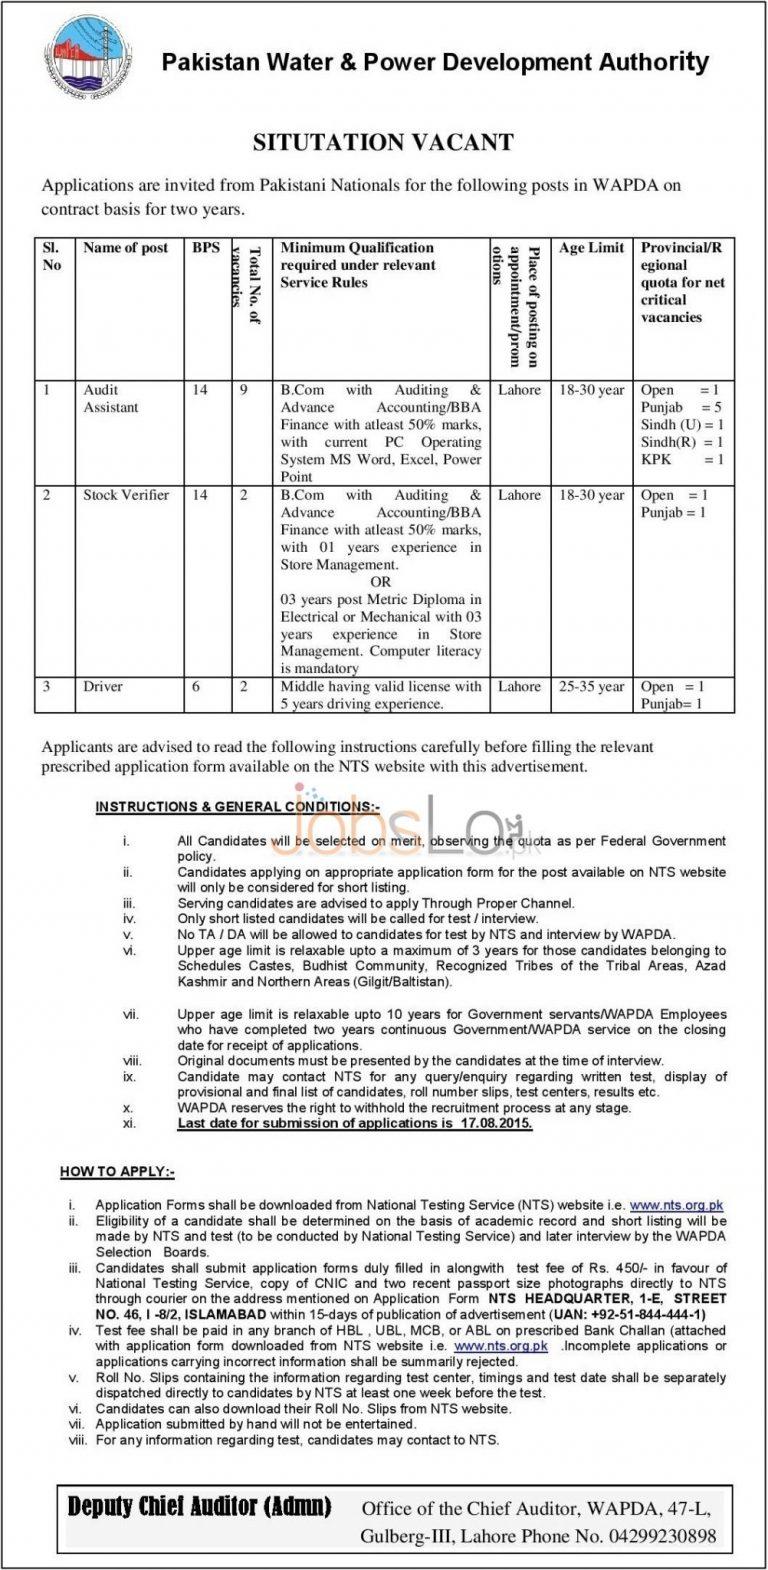 WAPDA NTS Jobs August 2015 Application Form for Audit Assistant, Stock Verifier & Driver